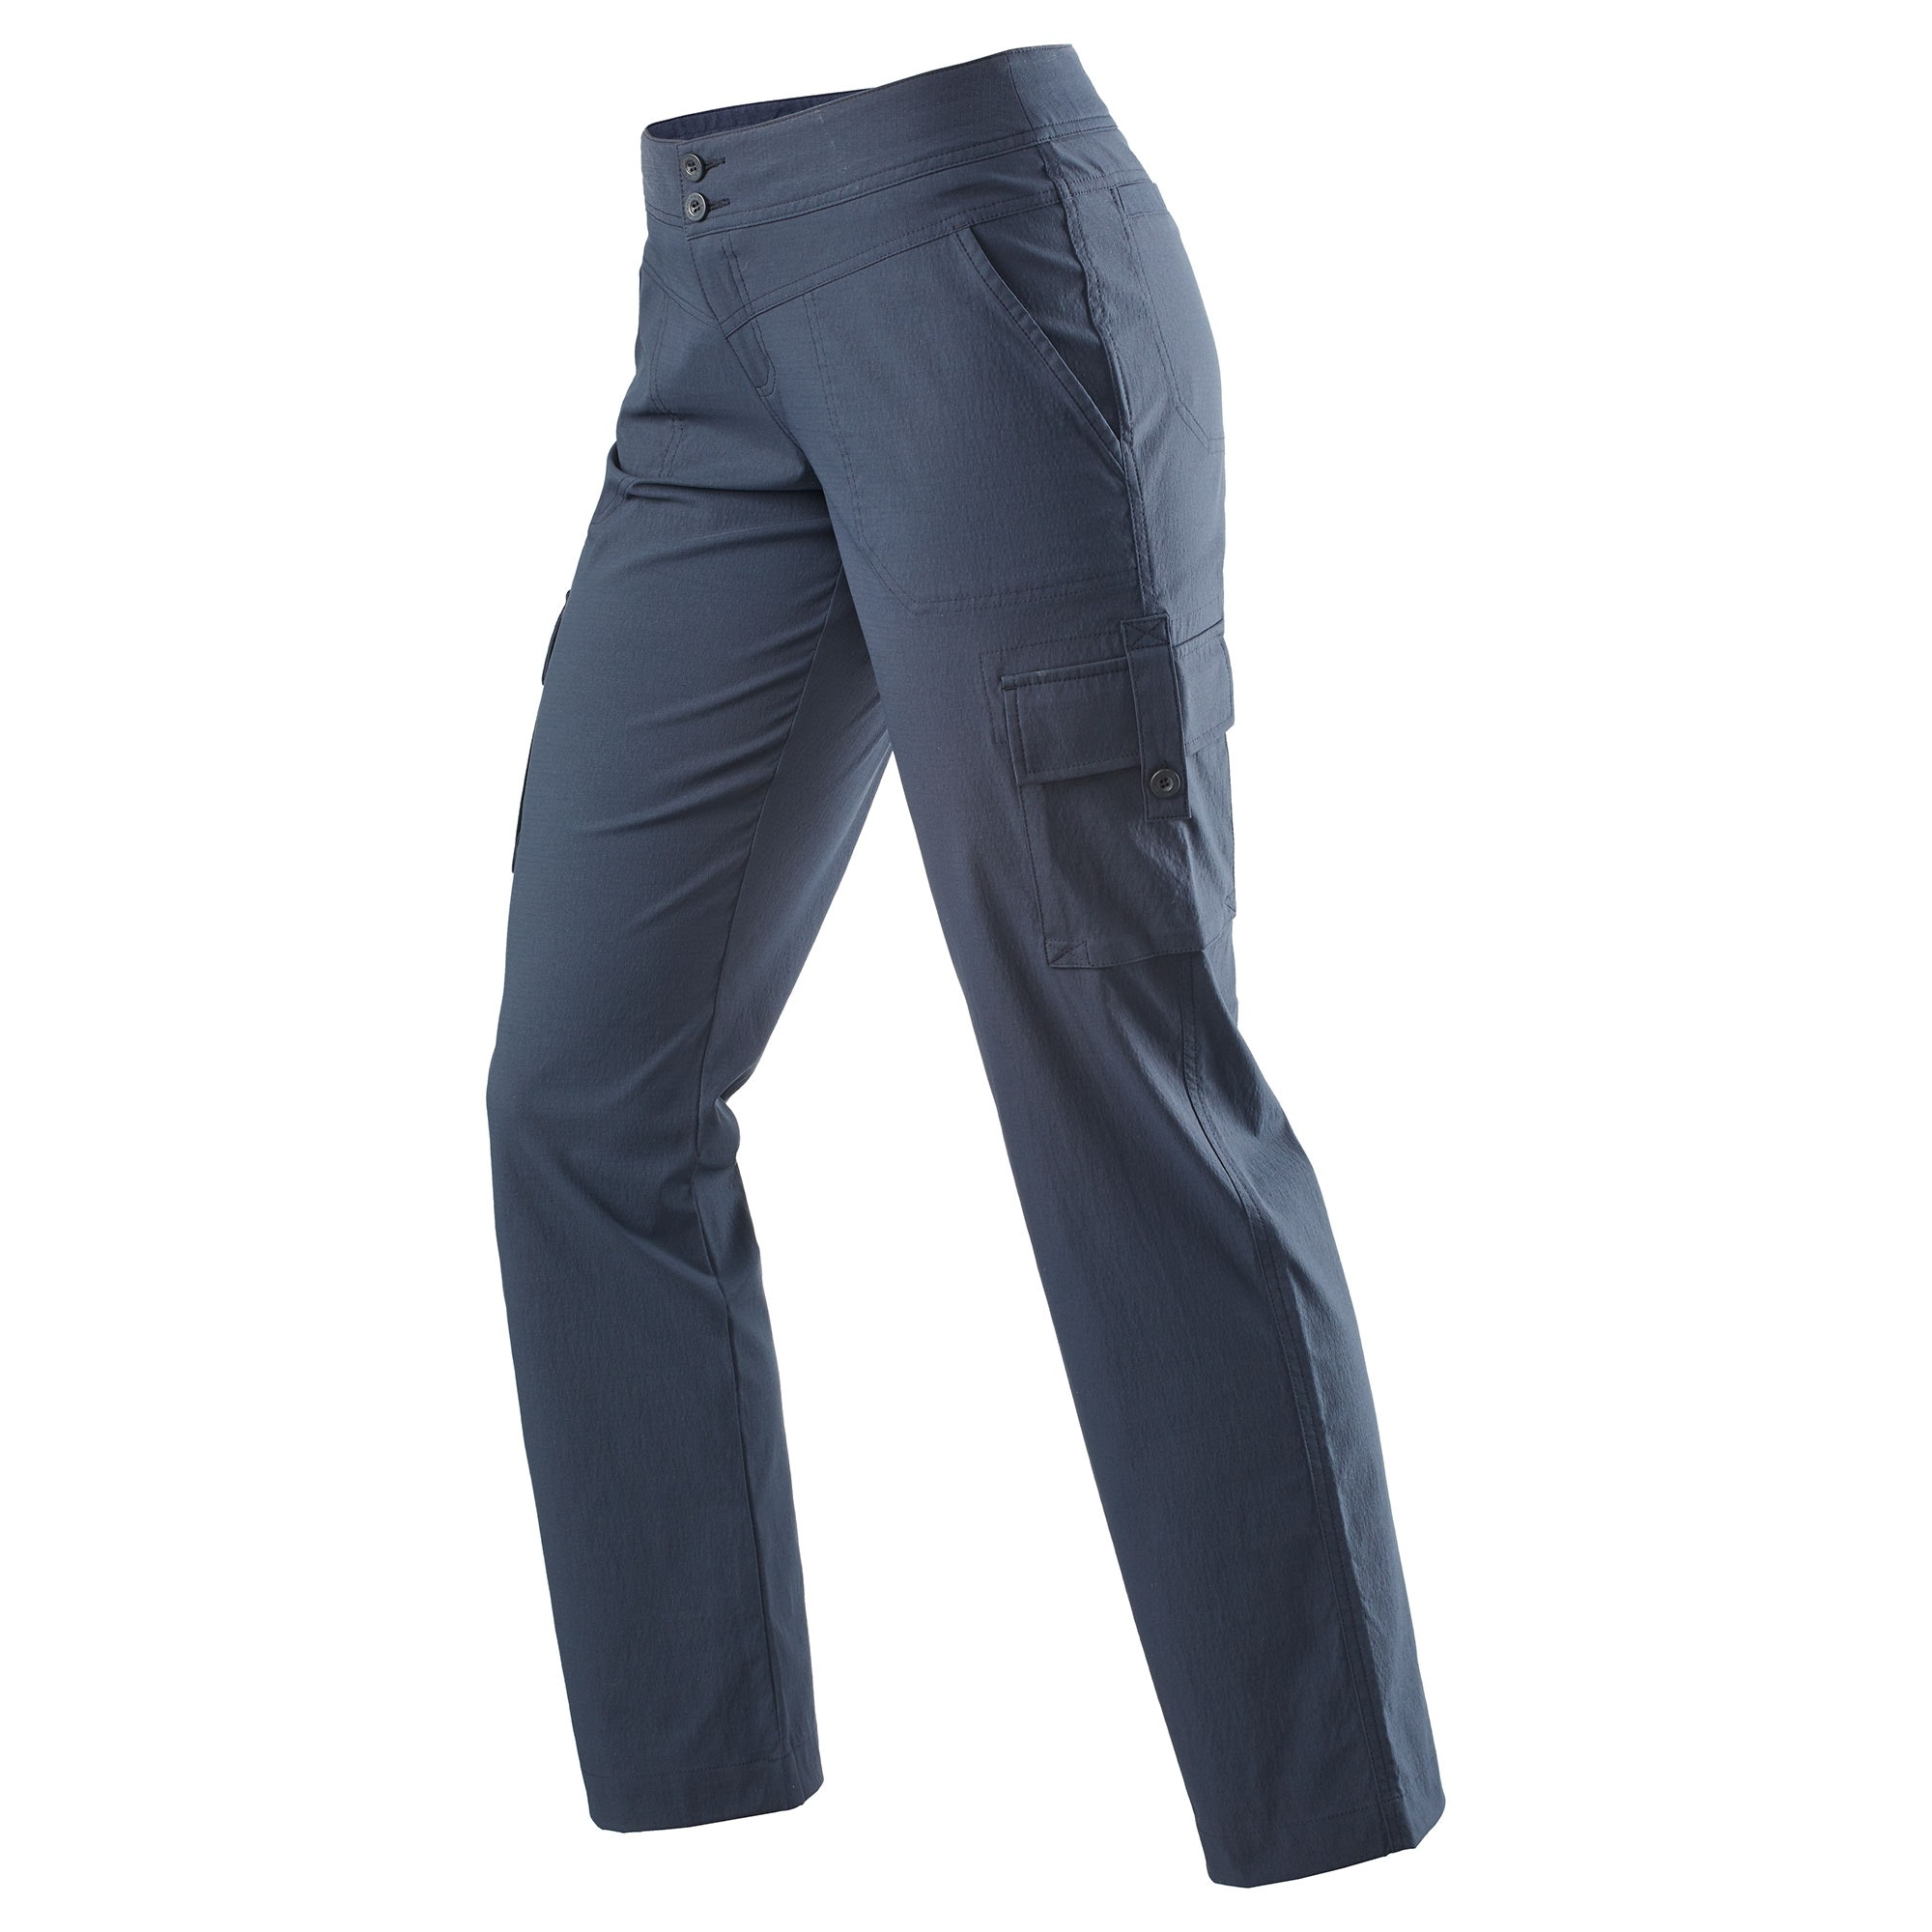 NEW-Kathmandu-Miro-Women-039-s-quickDRY-Pants-Trousers-Stretch-Travel-Cargo-Recycled thumbnail 15